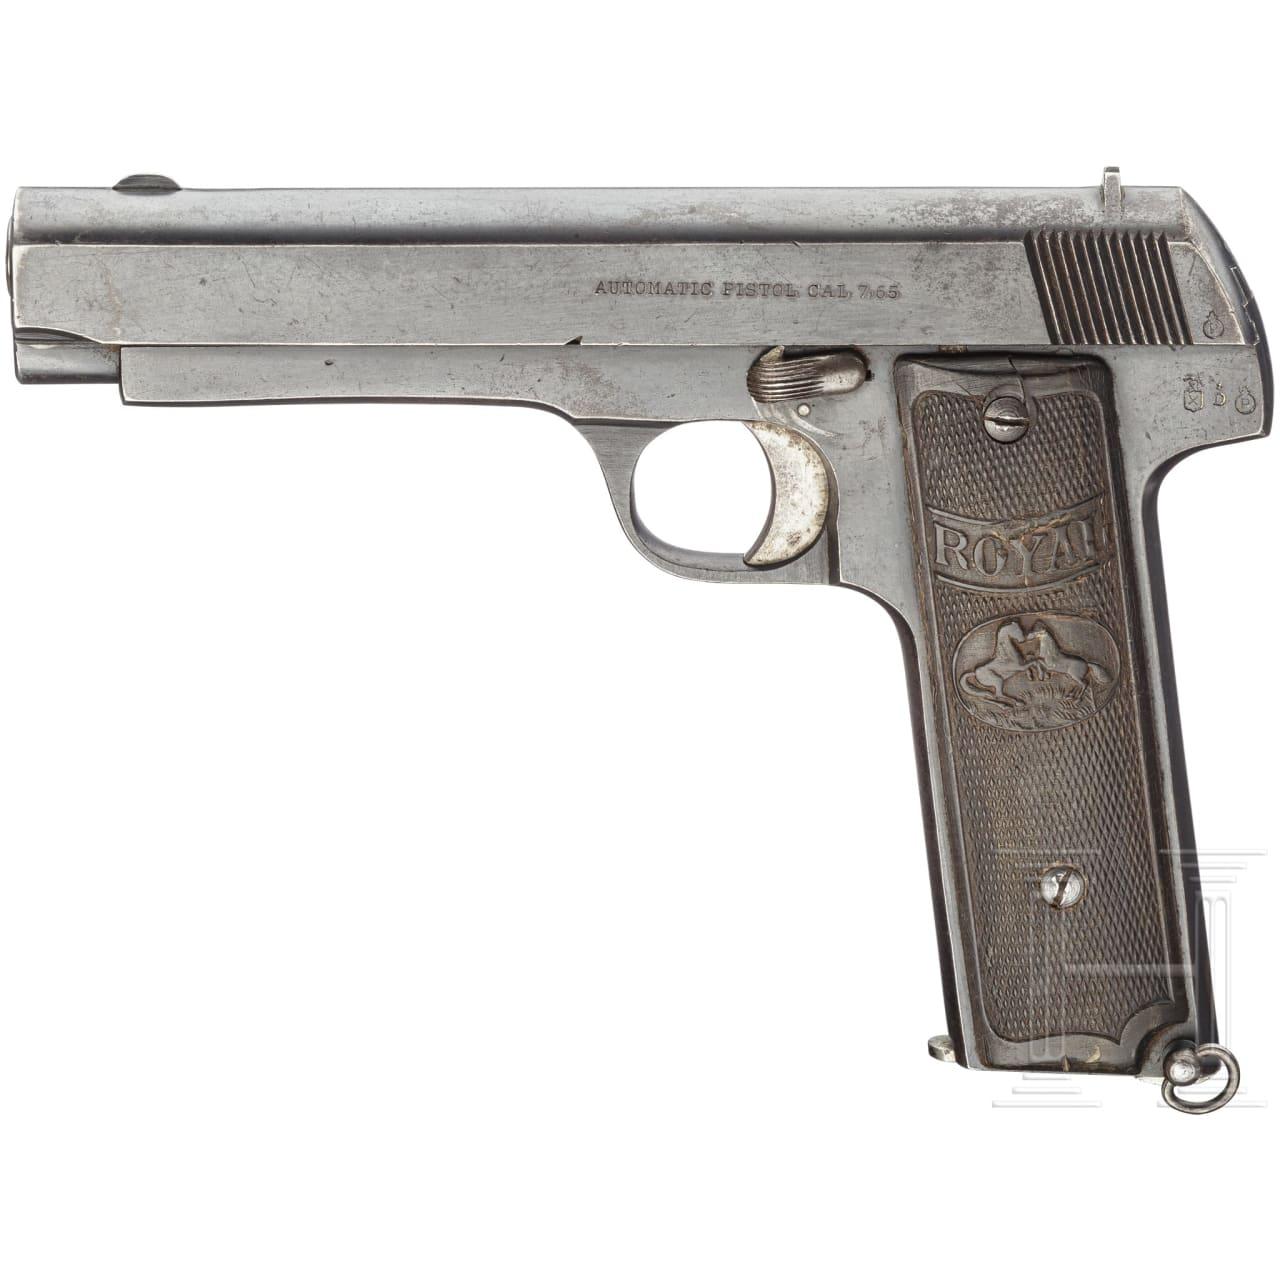 Royal pistol with long barrel